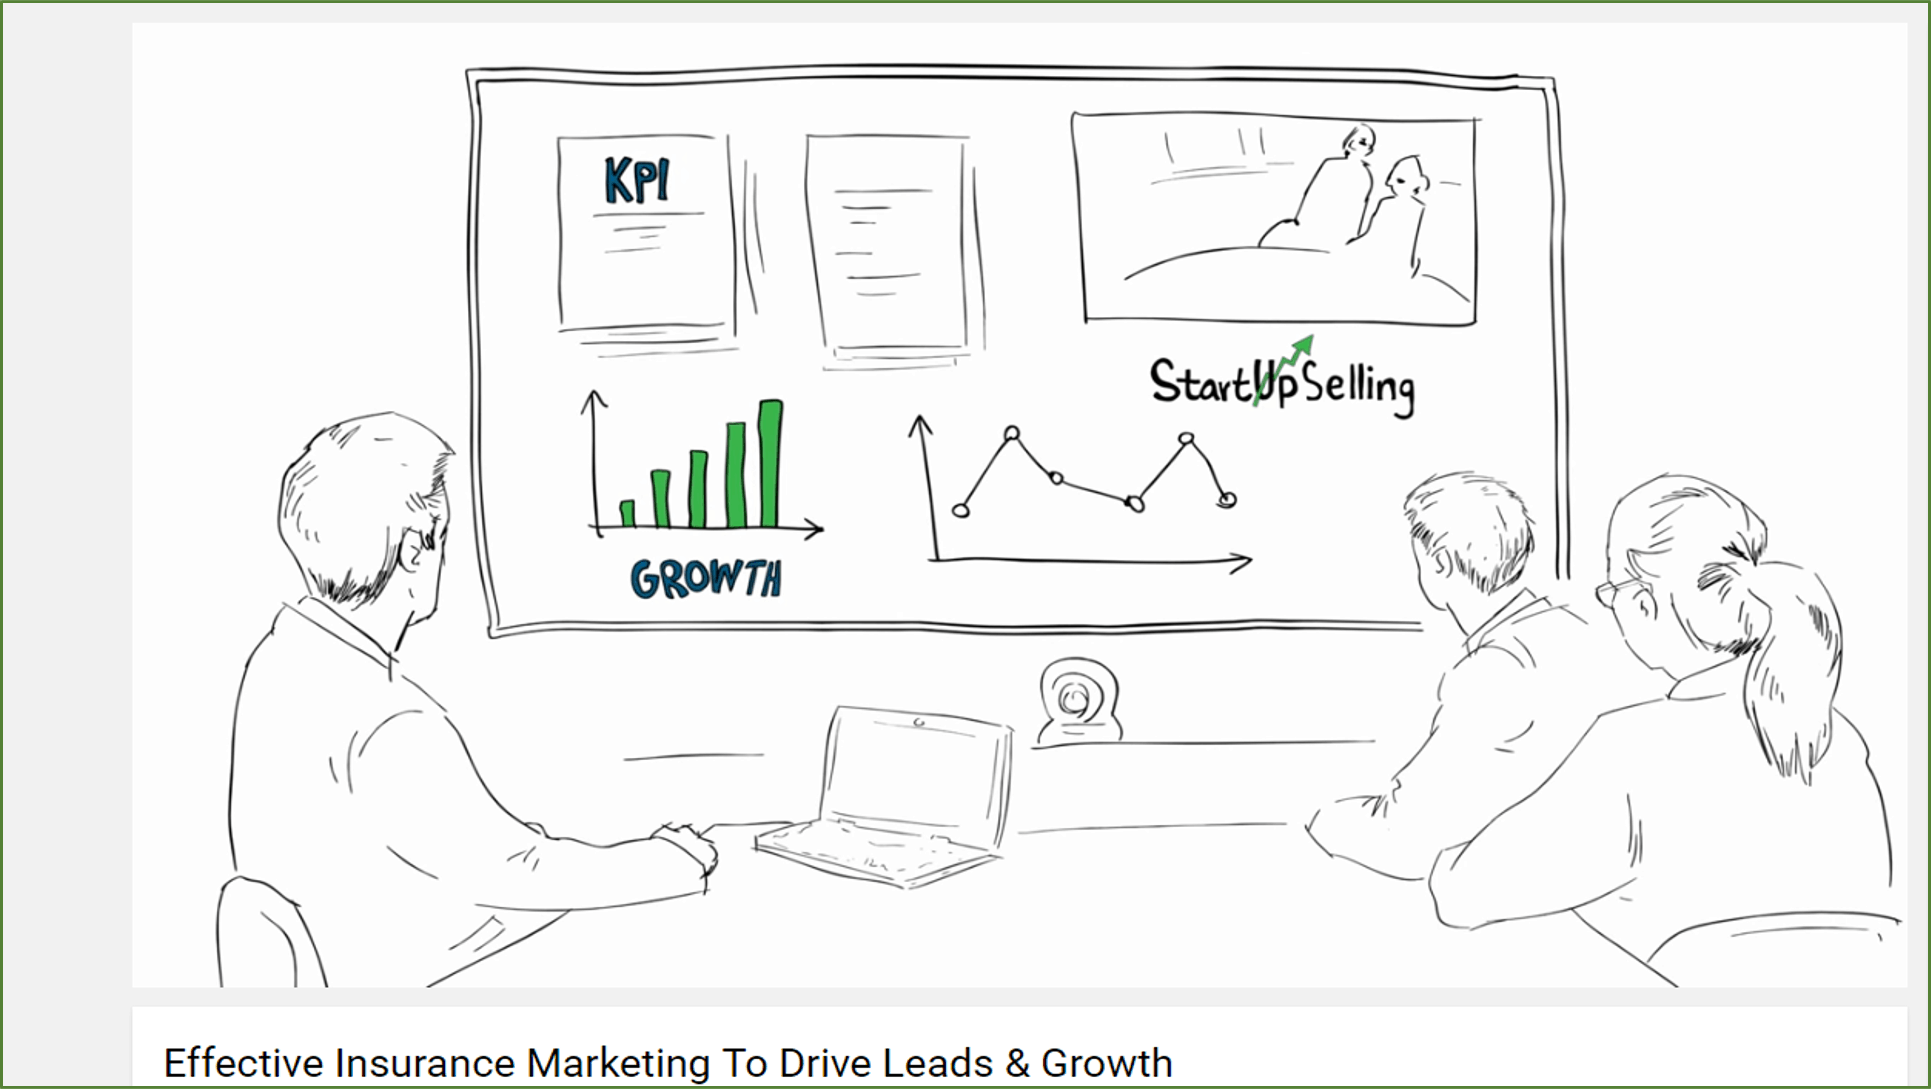 startupselling-insurance-agency-video